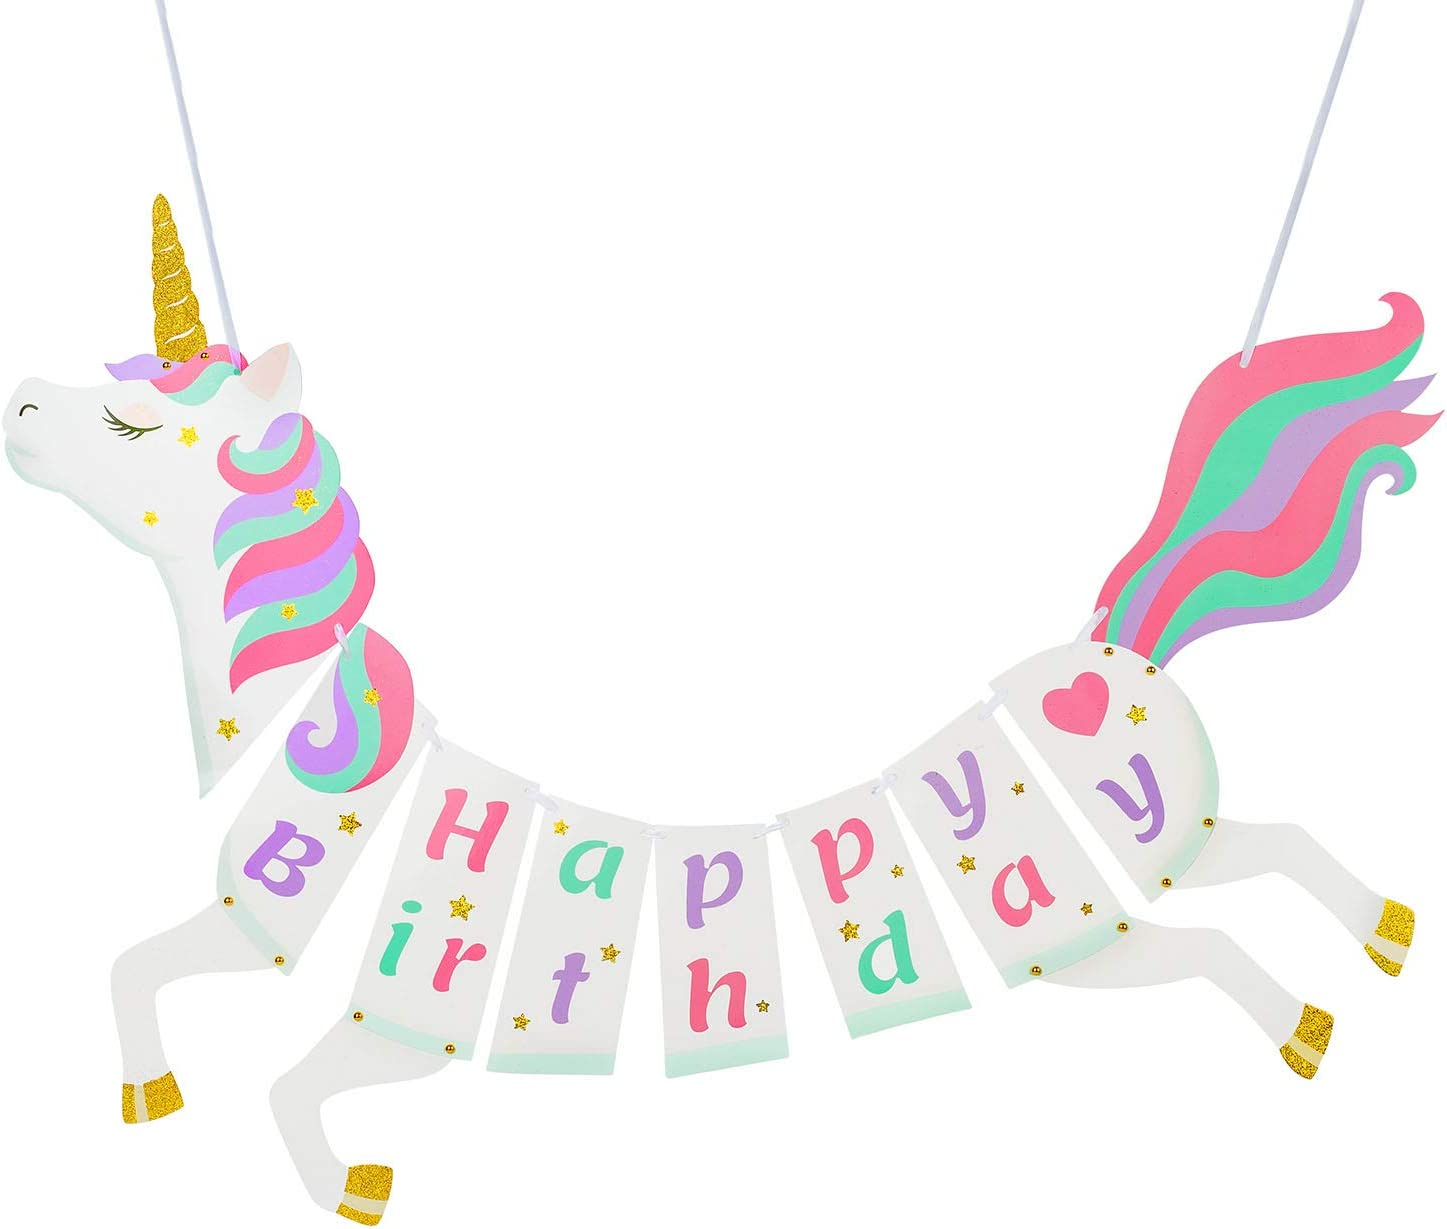 Unicorn birthday banner Unicorn decorations First Birthday Decorations Unicorn banner UnicornHappy Birthday Banner Unicorn party